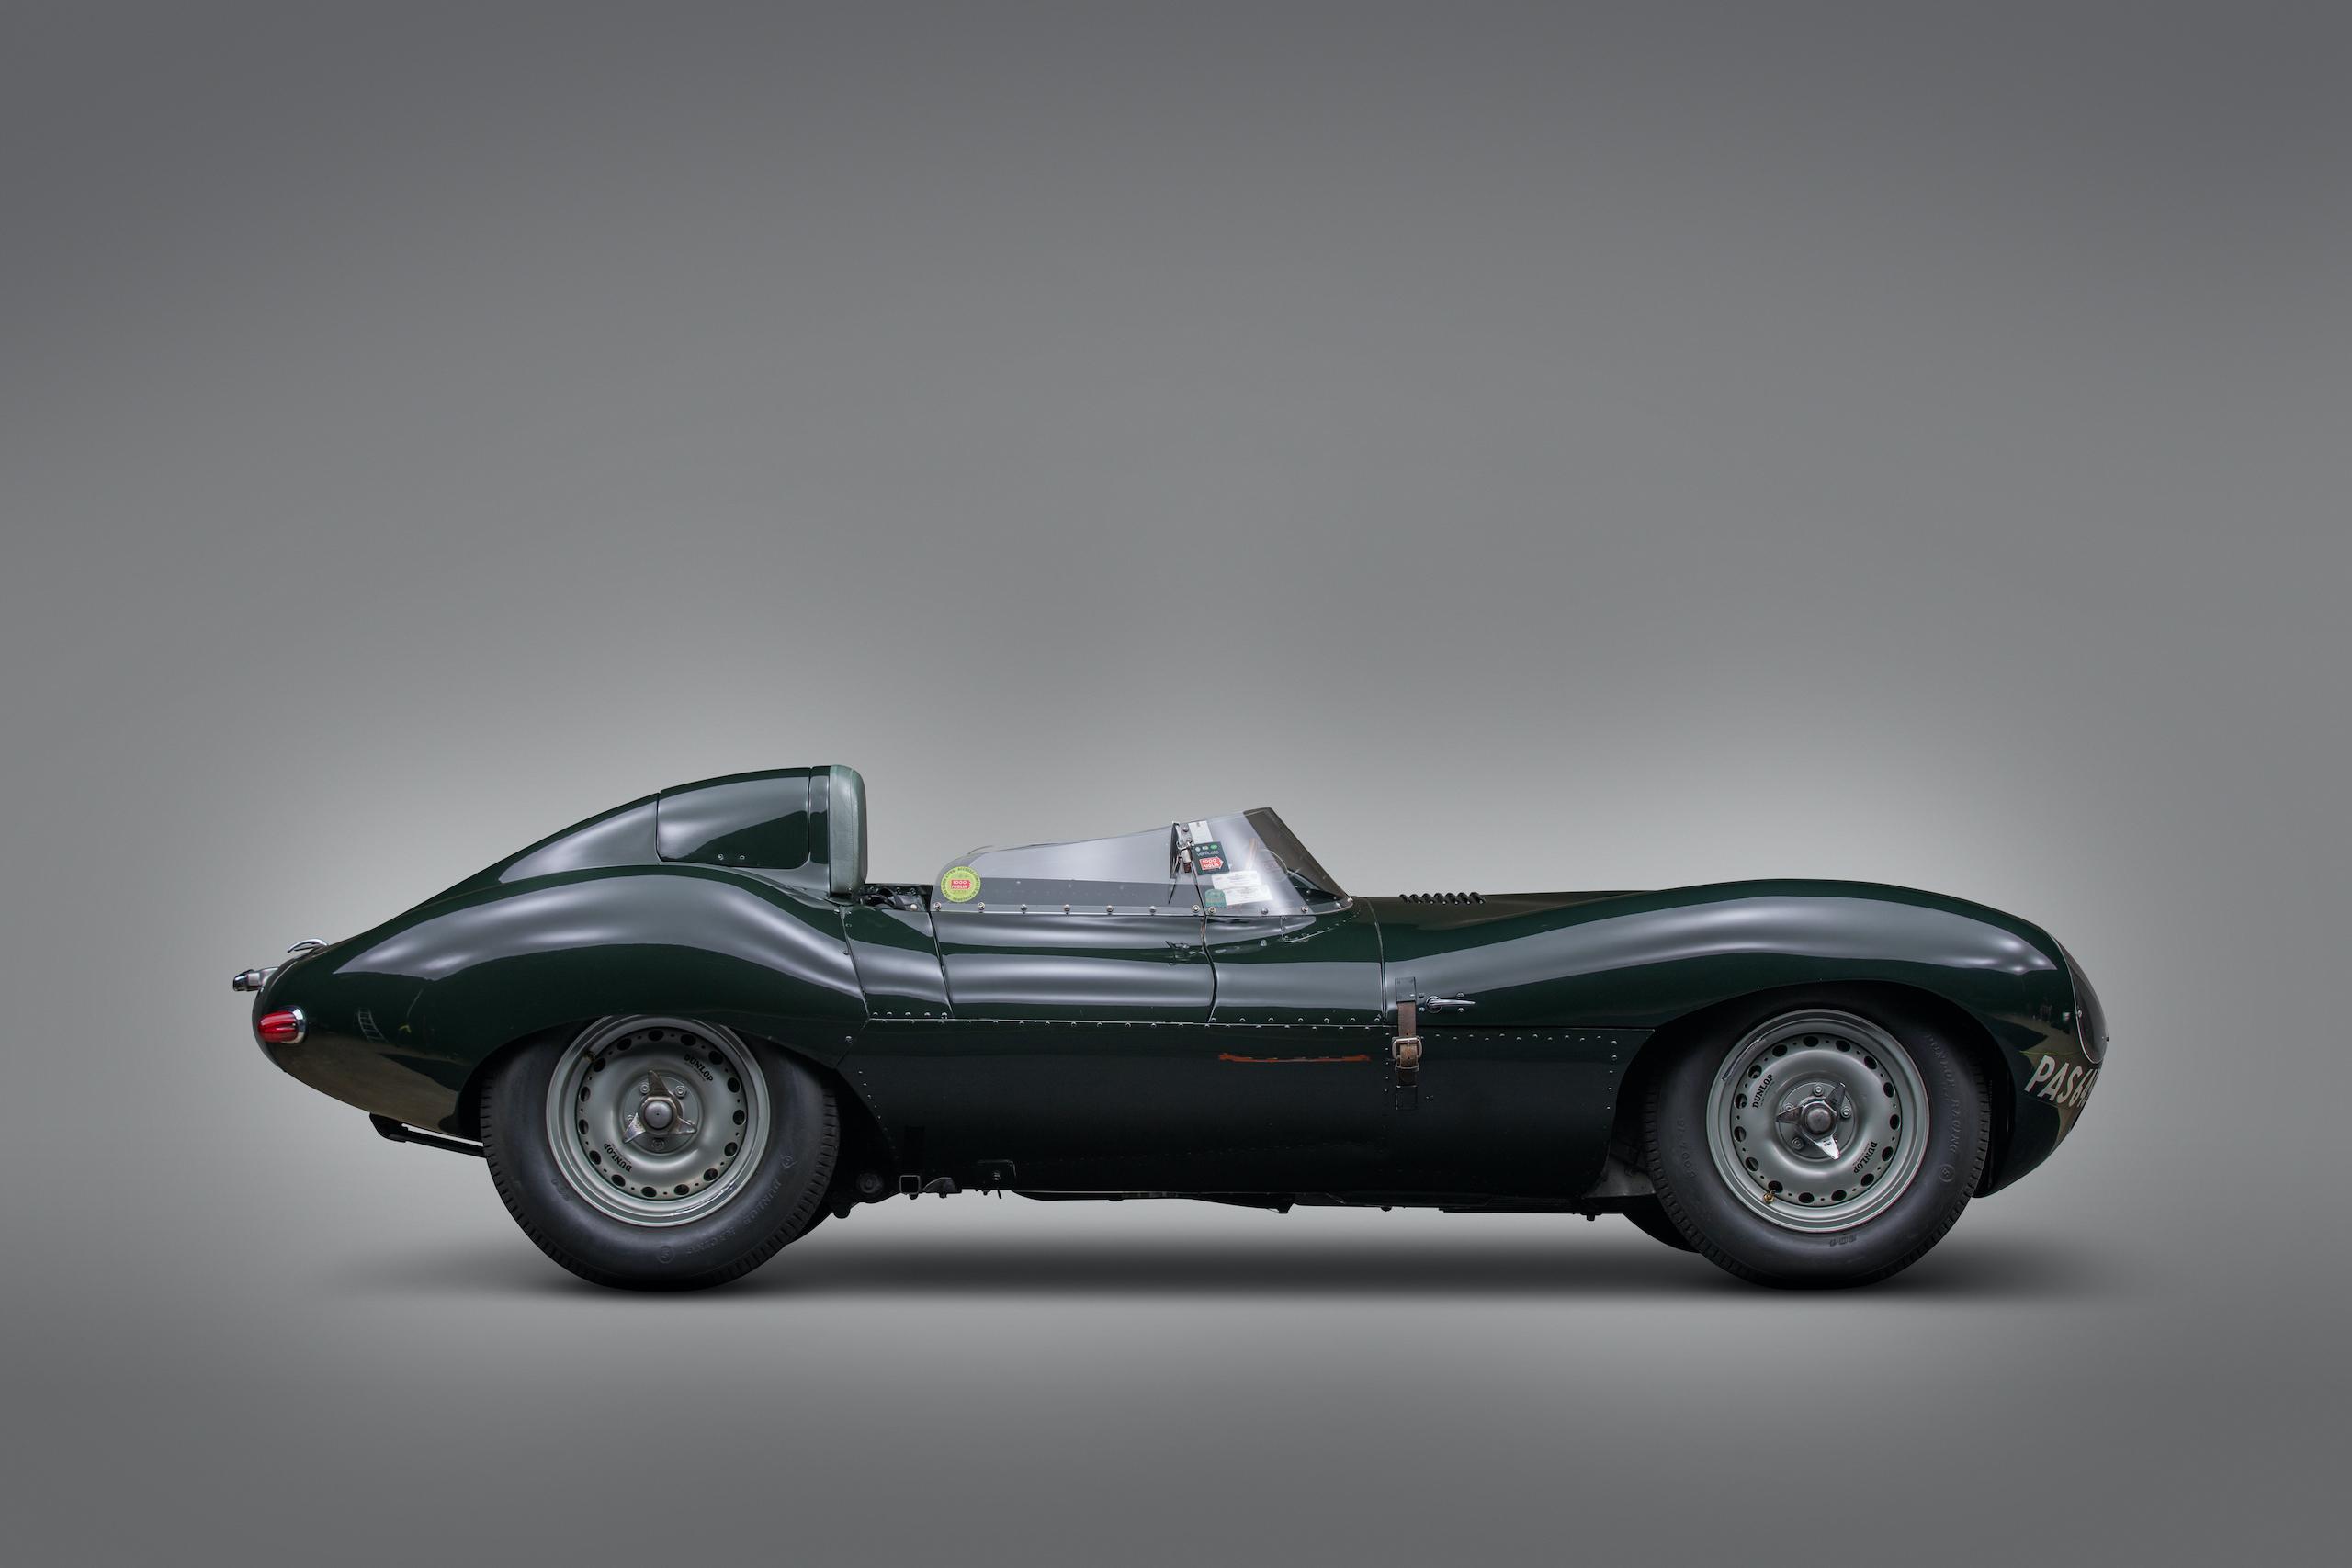 jaguar d-type side profile